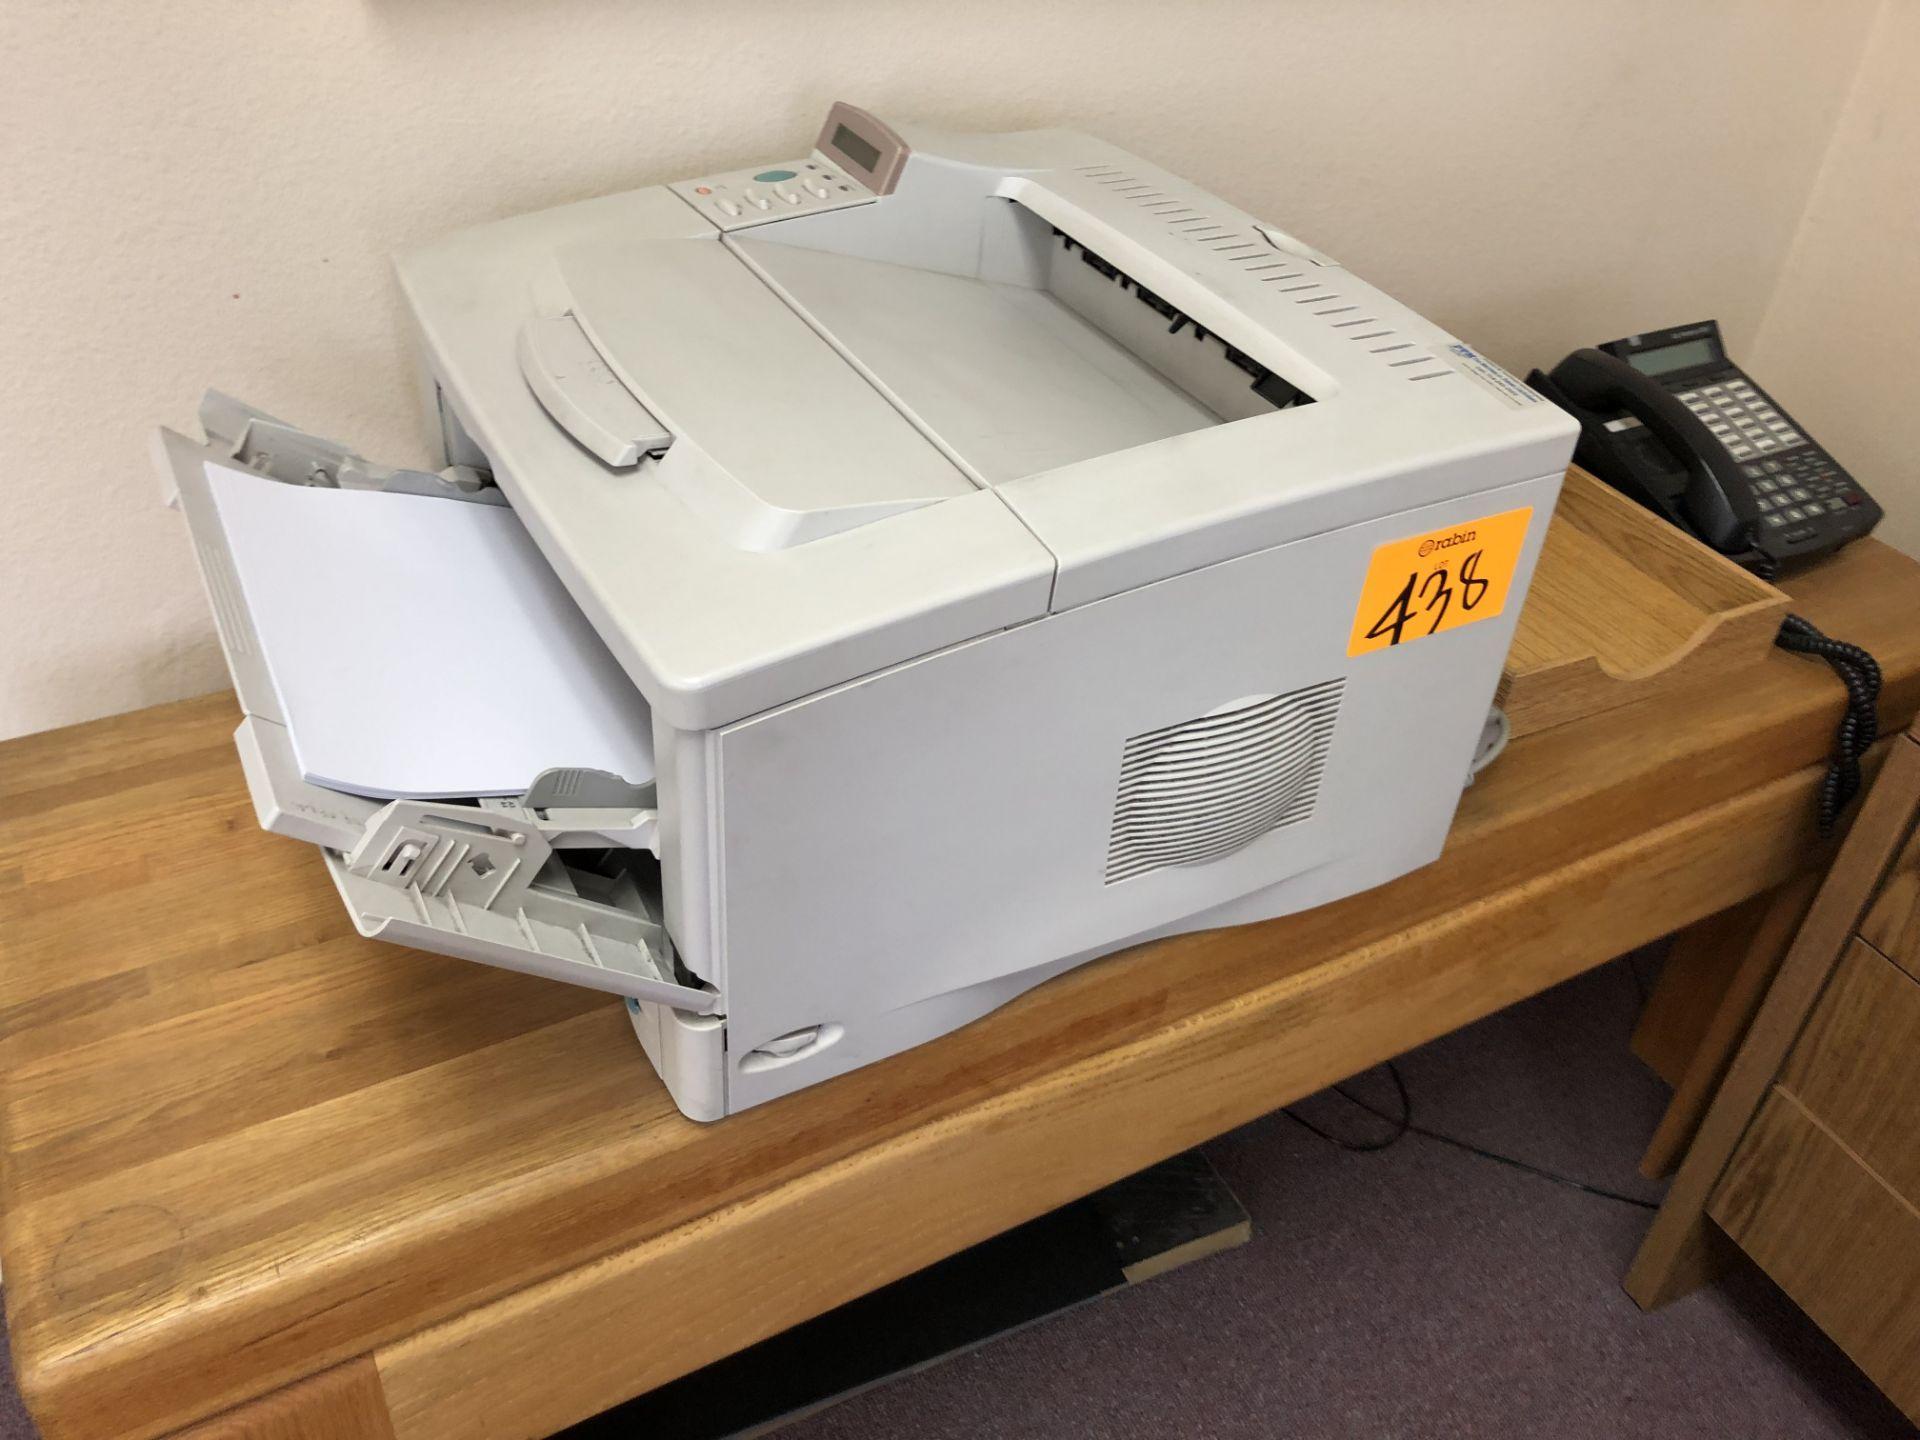 Lot 438 - Printer